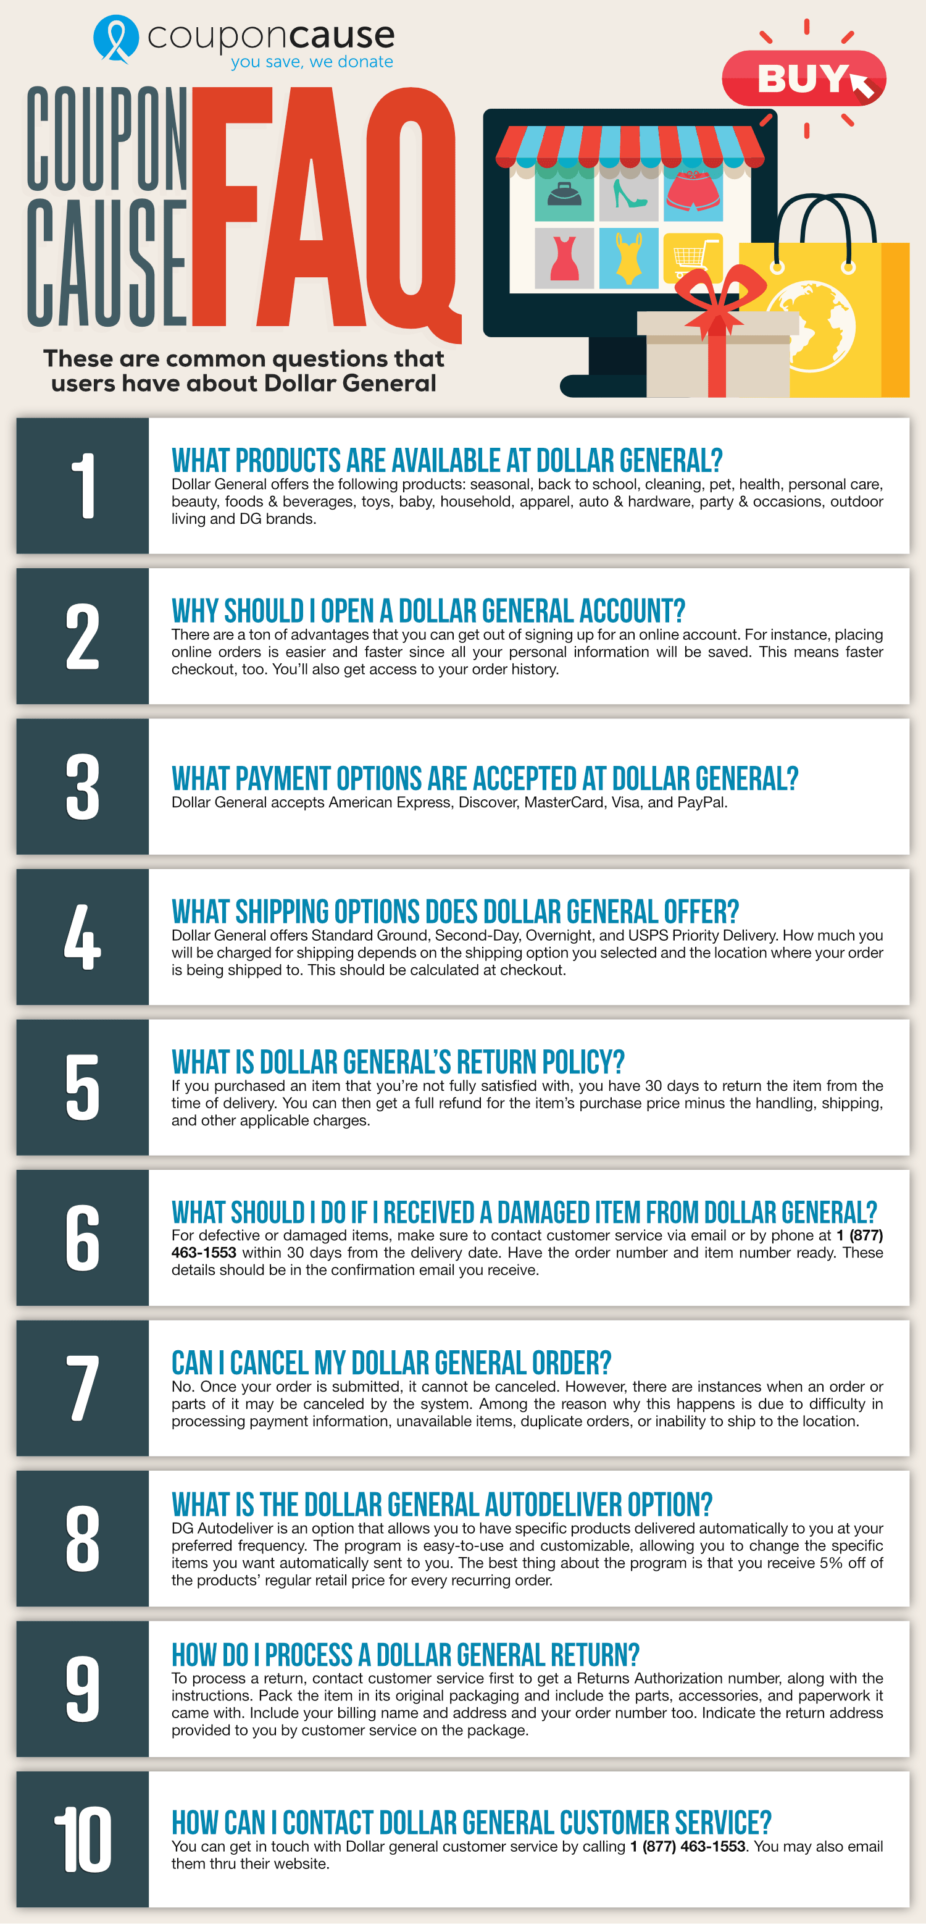 Dollar General Infographic Order Coupon Cause FAQ (C.C. FAQ)